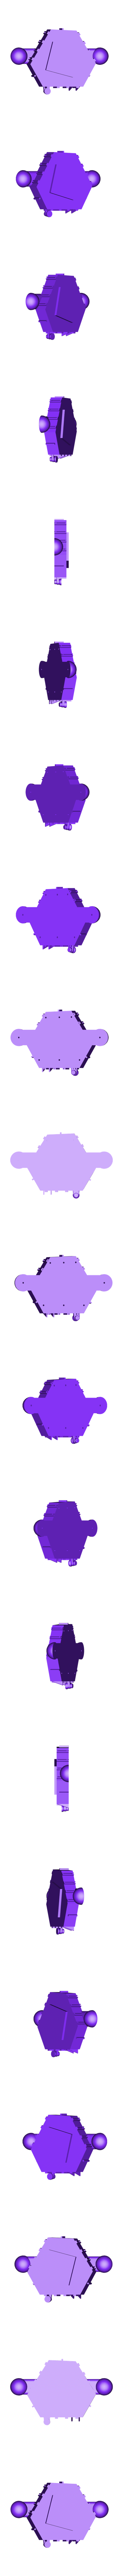 Viking 3D Bottom.stl Download free STL file Viking Lander - STL • 3D printable object, spac3D